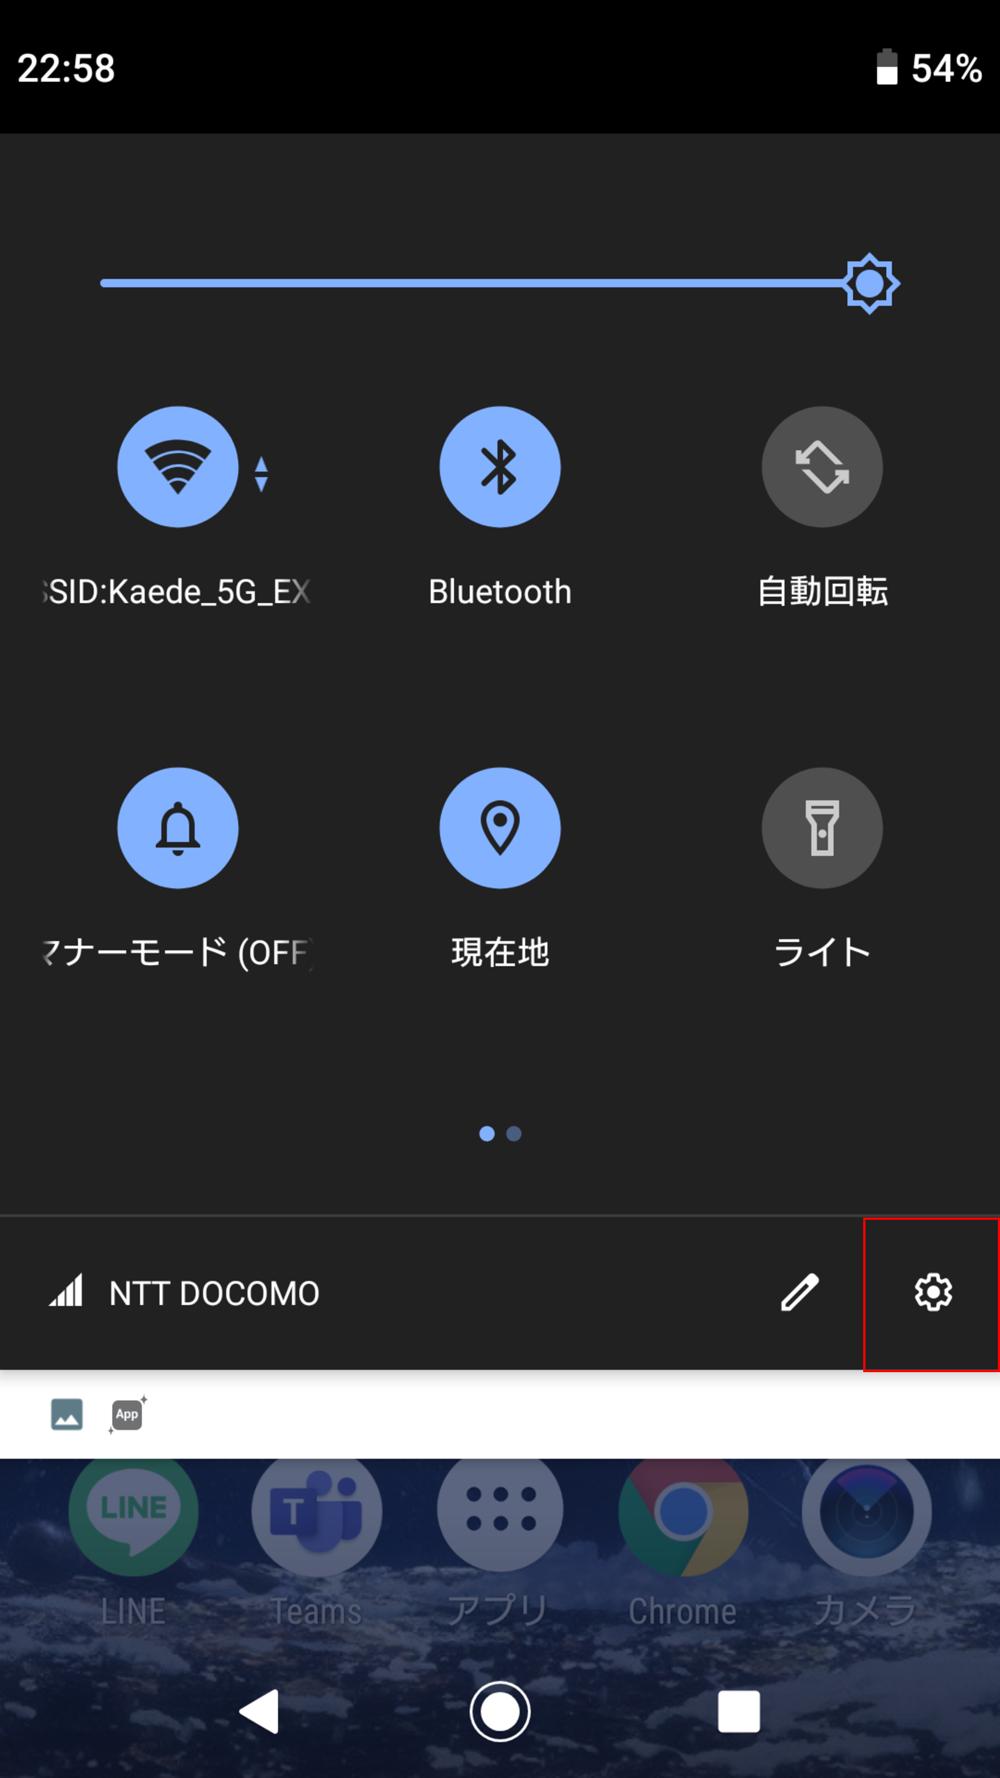 NTT docomo SO - 04J:[設定] をタップ